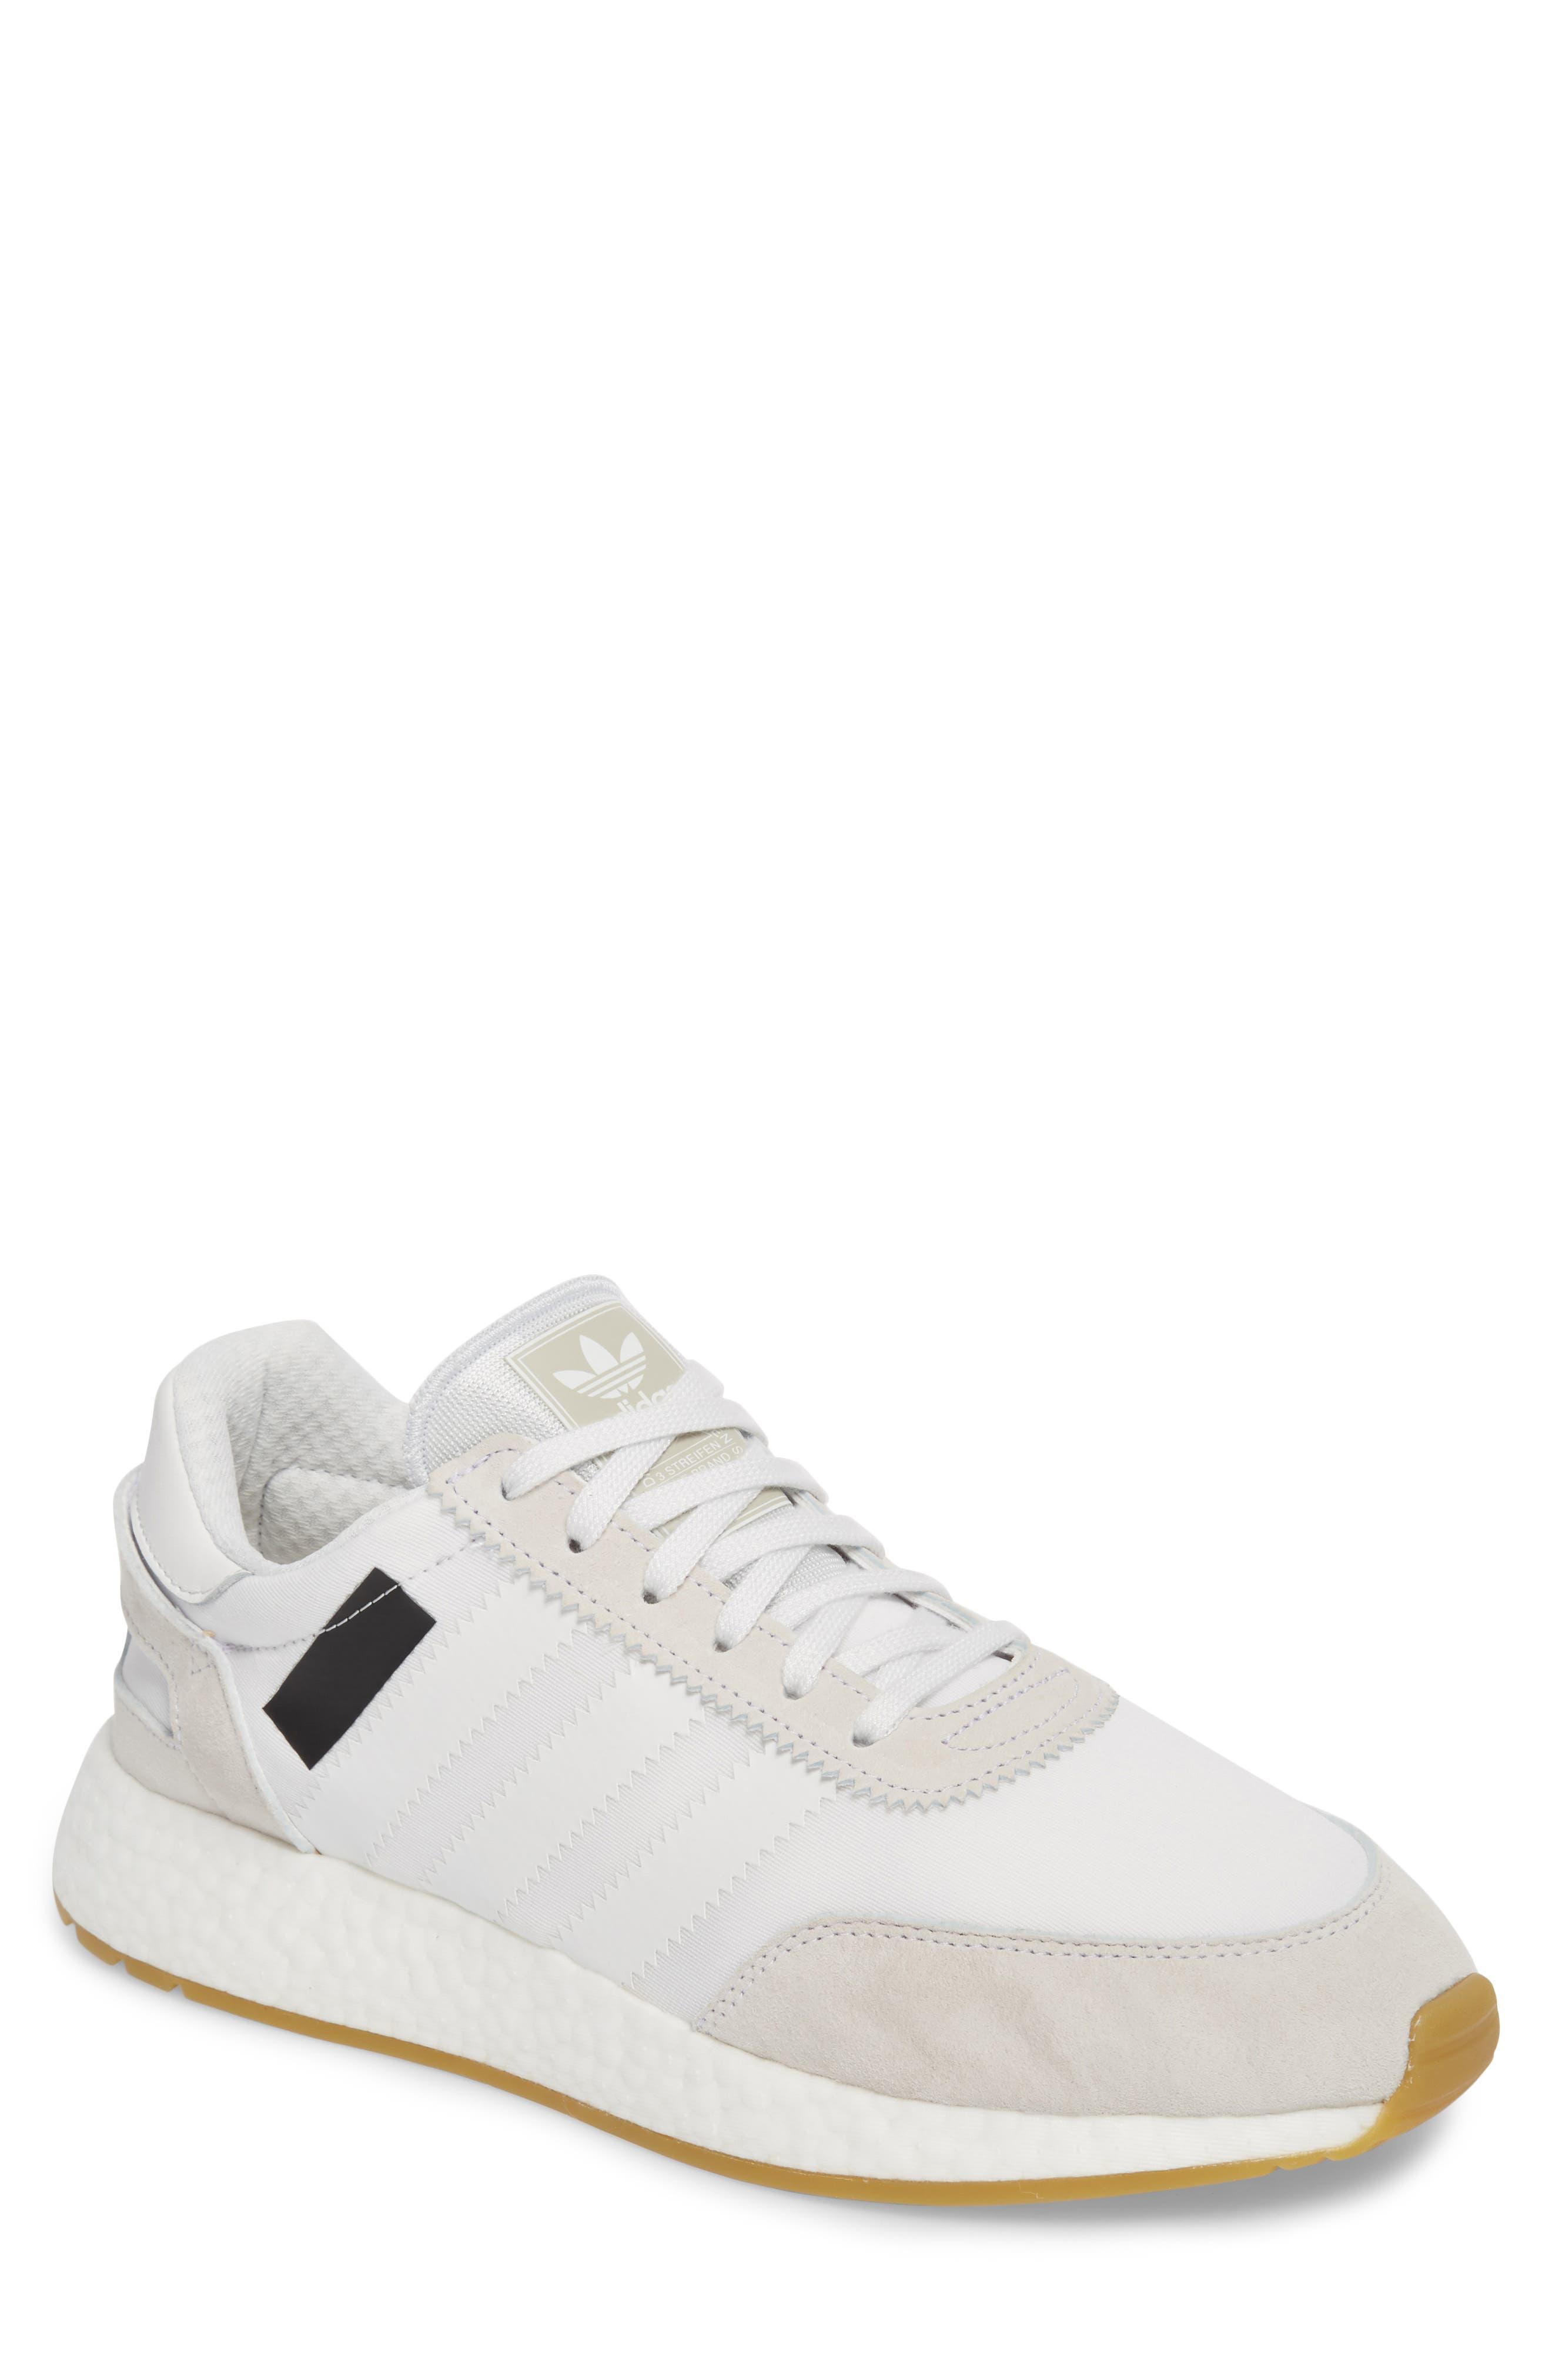 I-5923 Sneaker,                         Main,                         color, Crystal White/ White